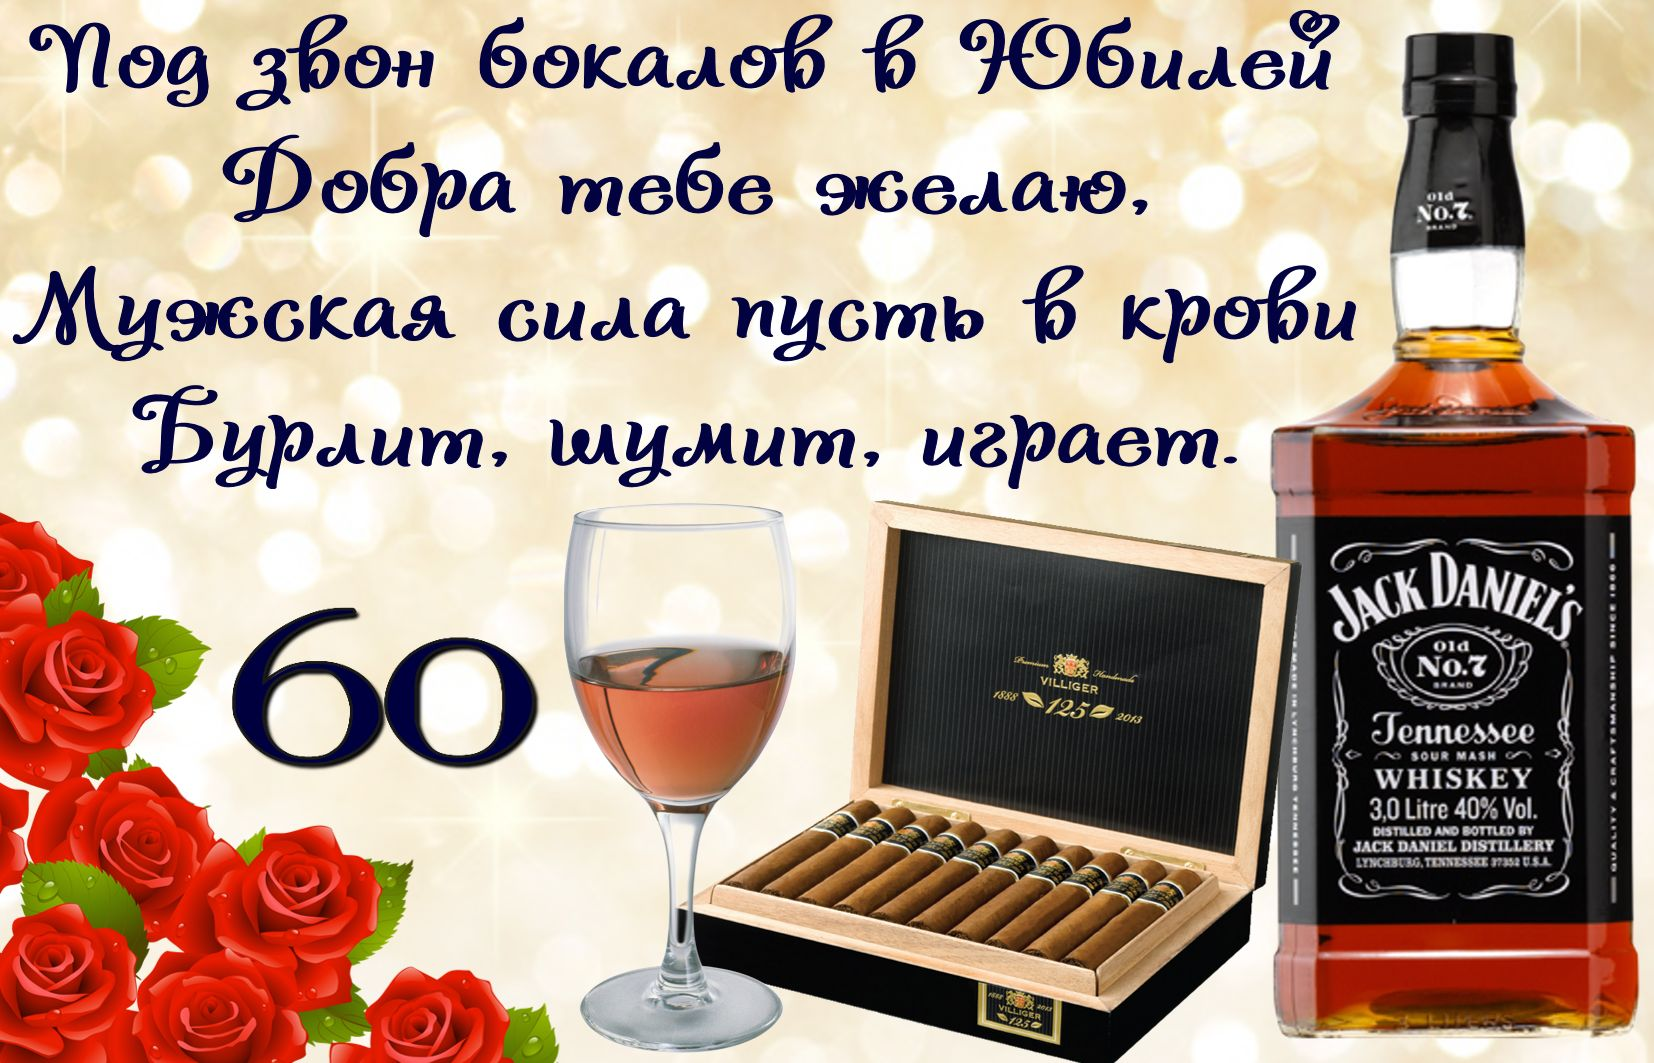 https://i3.imageban.ru/out/2020/01/05/7537c53d088ef7b4cc8b27bf9650c759.jpg